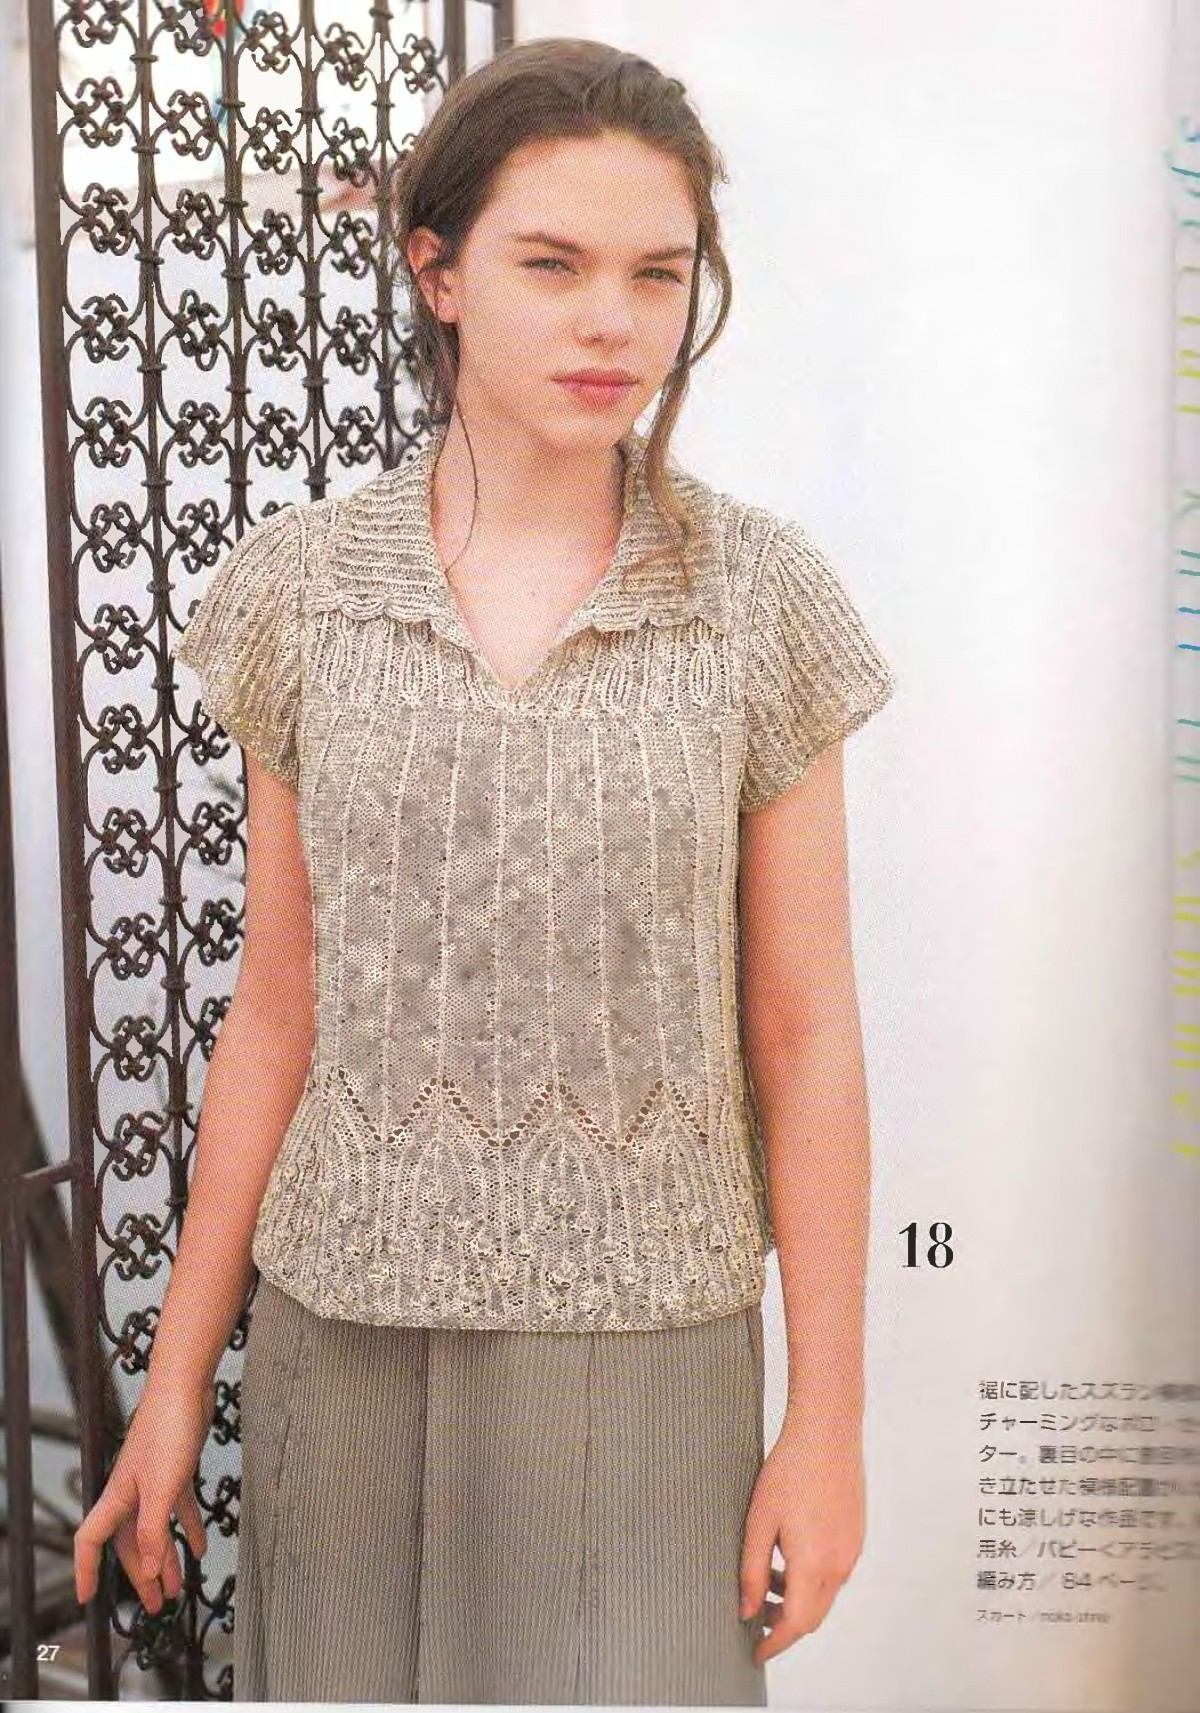 Lets-knit-series-NV4359-2008-Spring-Summer-sp-kr_25.jpg